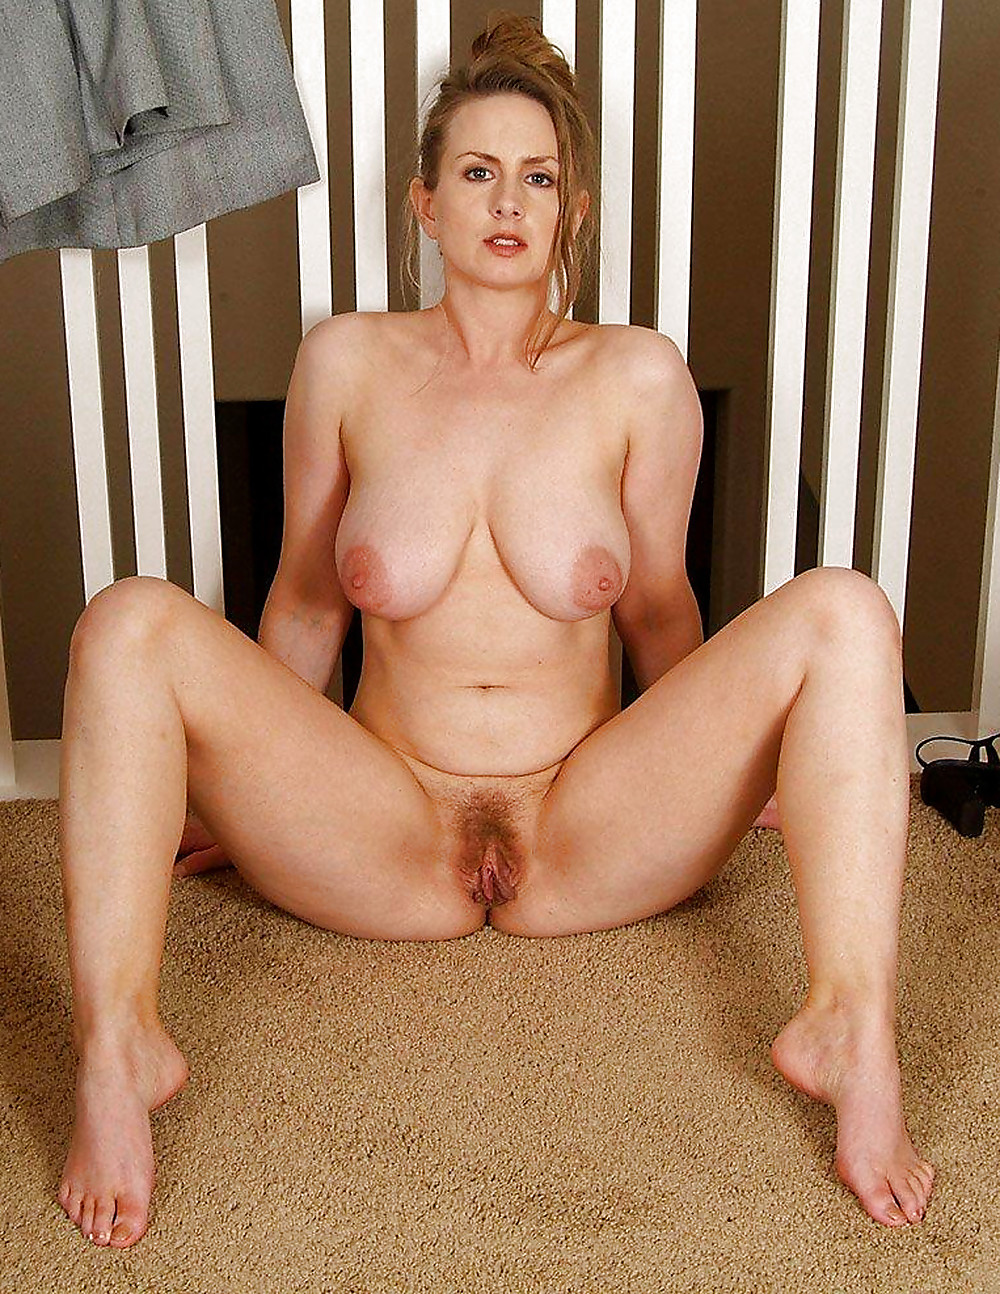 texas-mom-naked-pics-nerdy-japanese-girl-naked